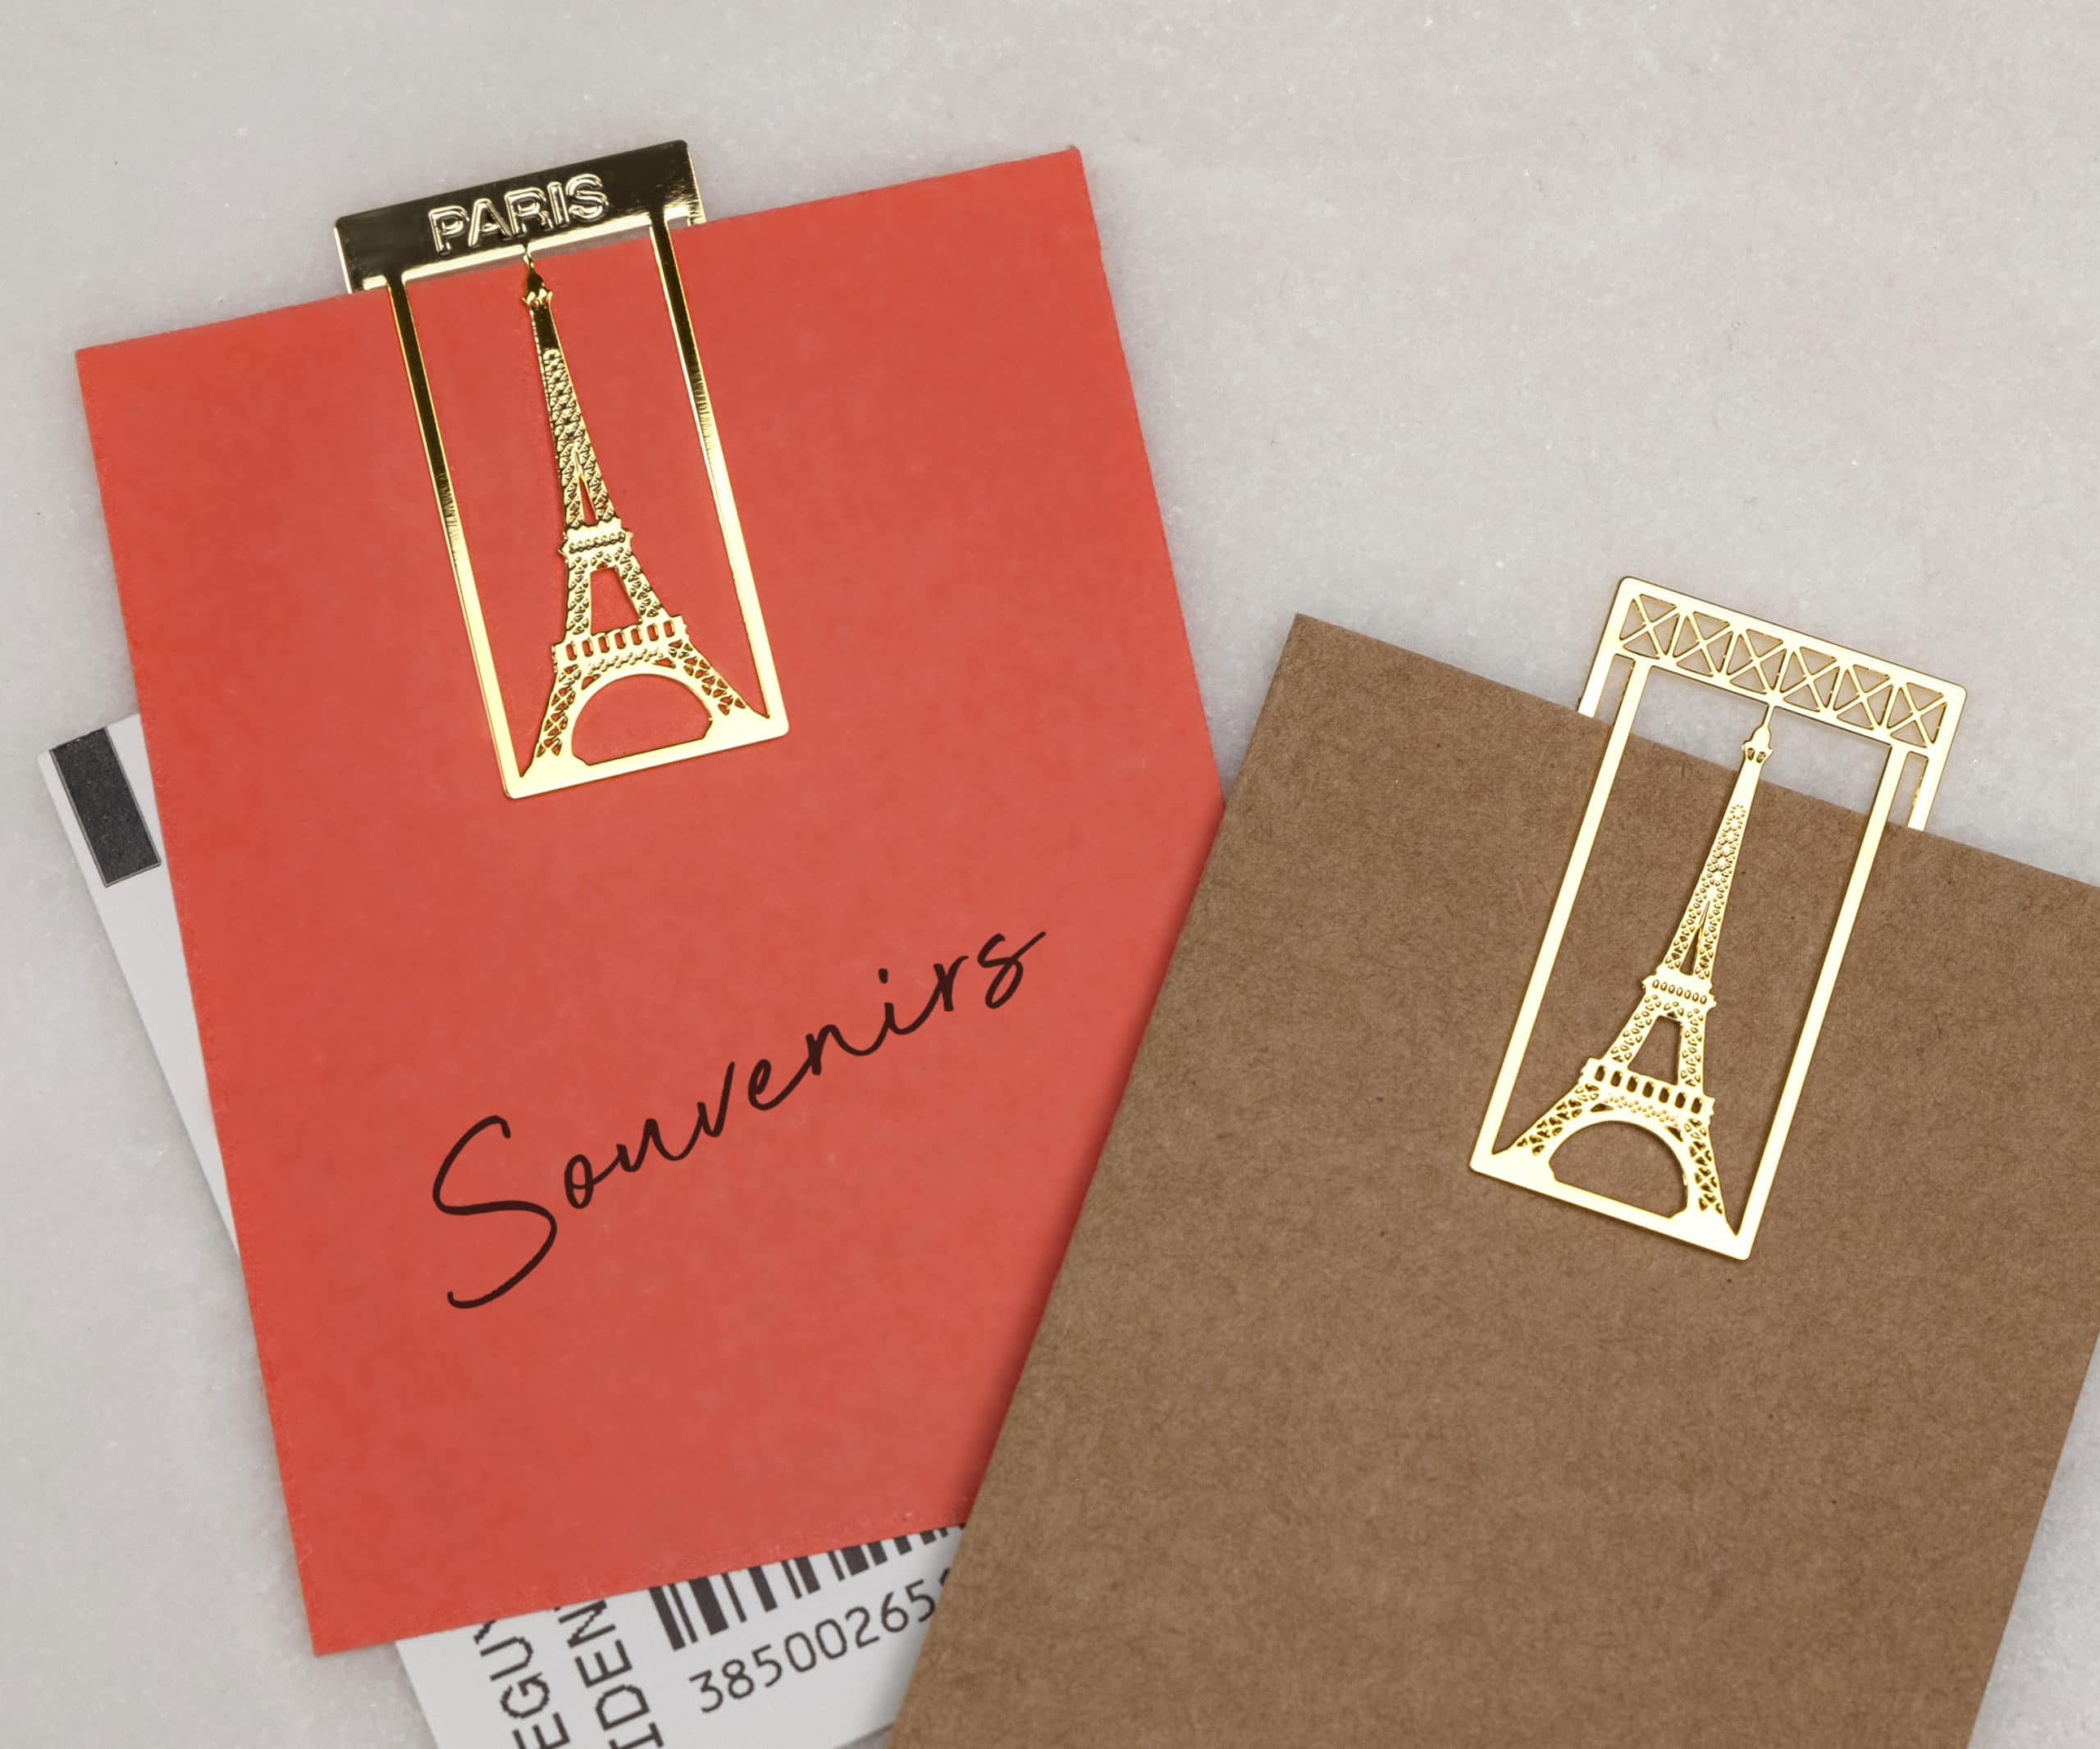 Trombone Tour Eiffel